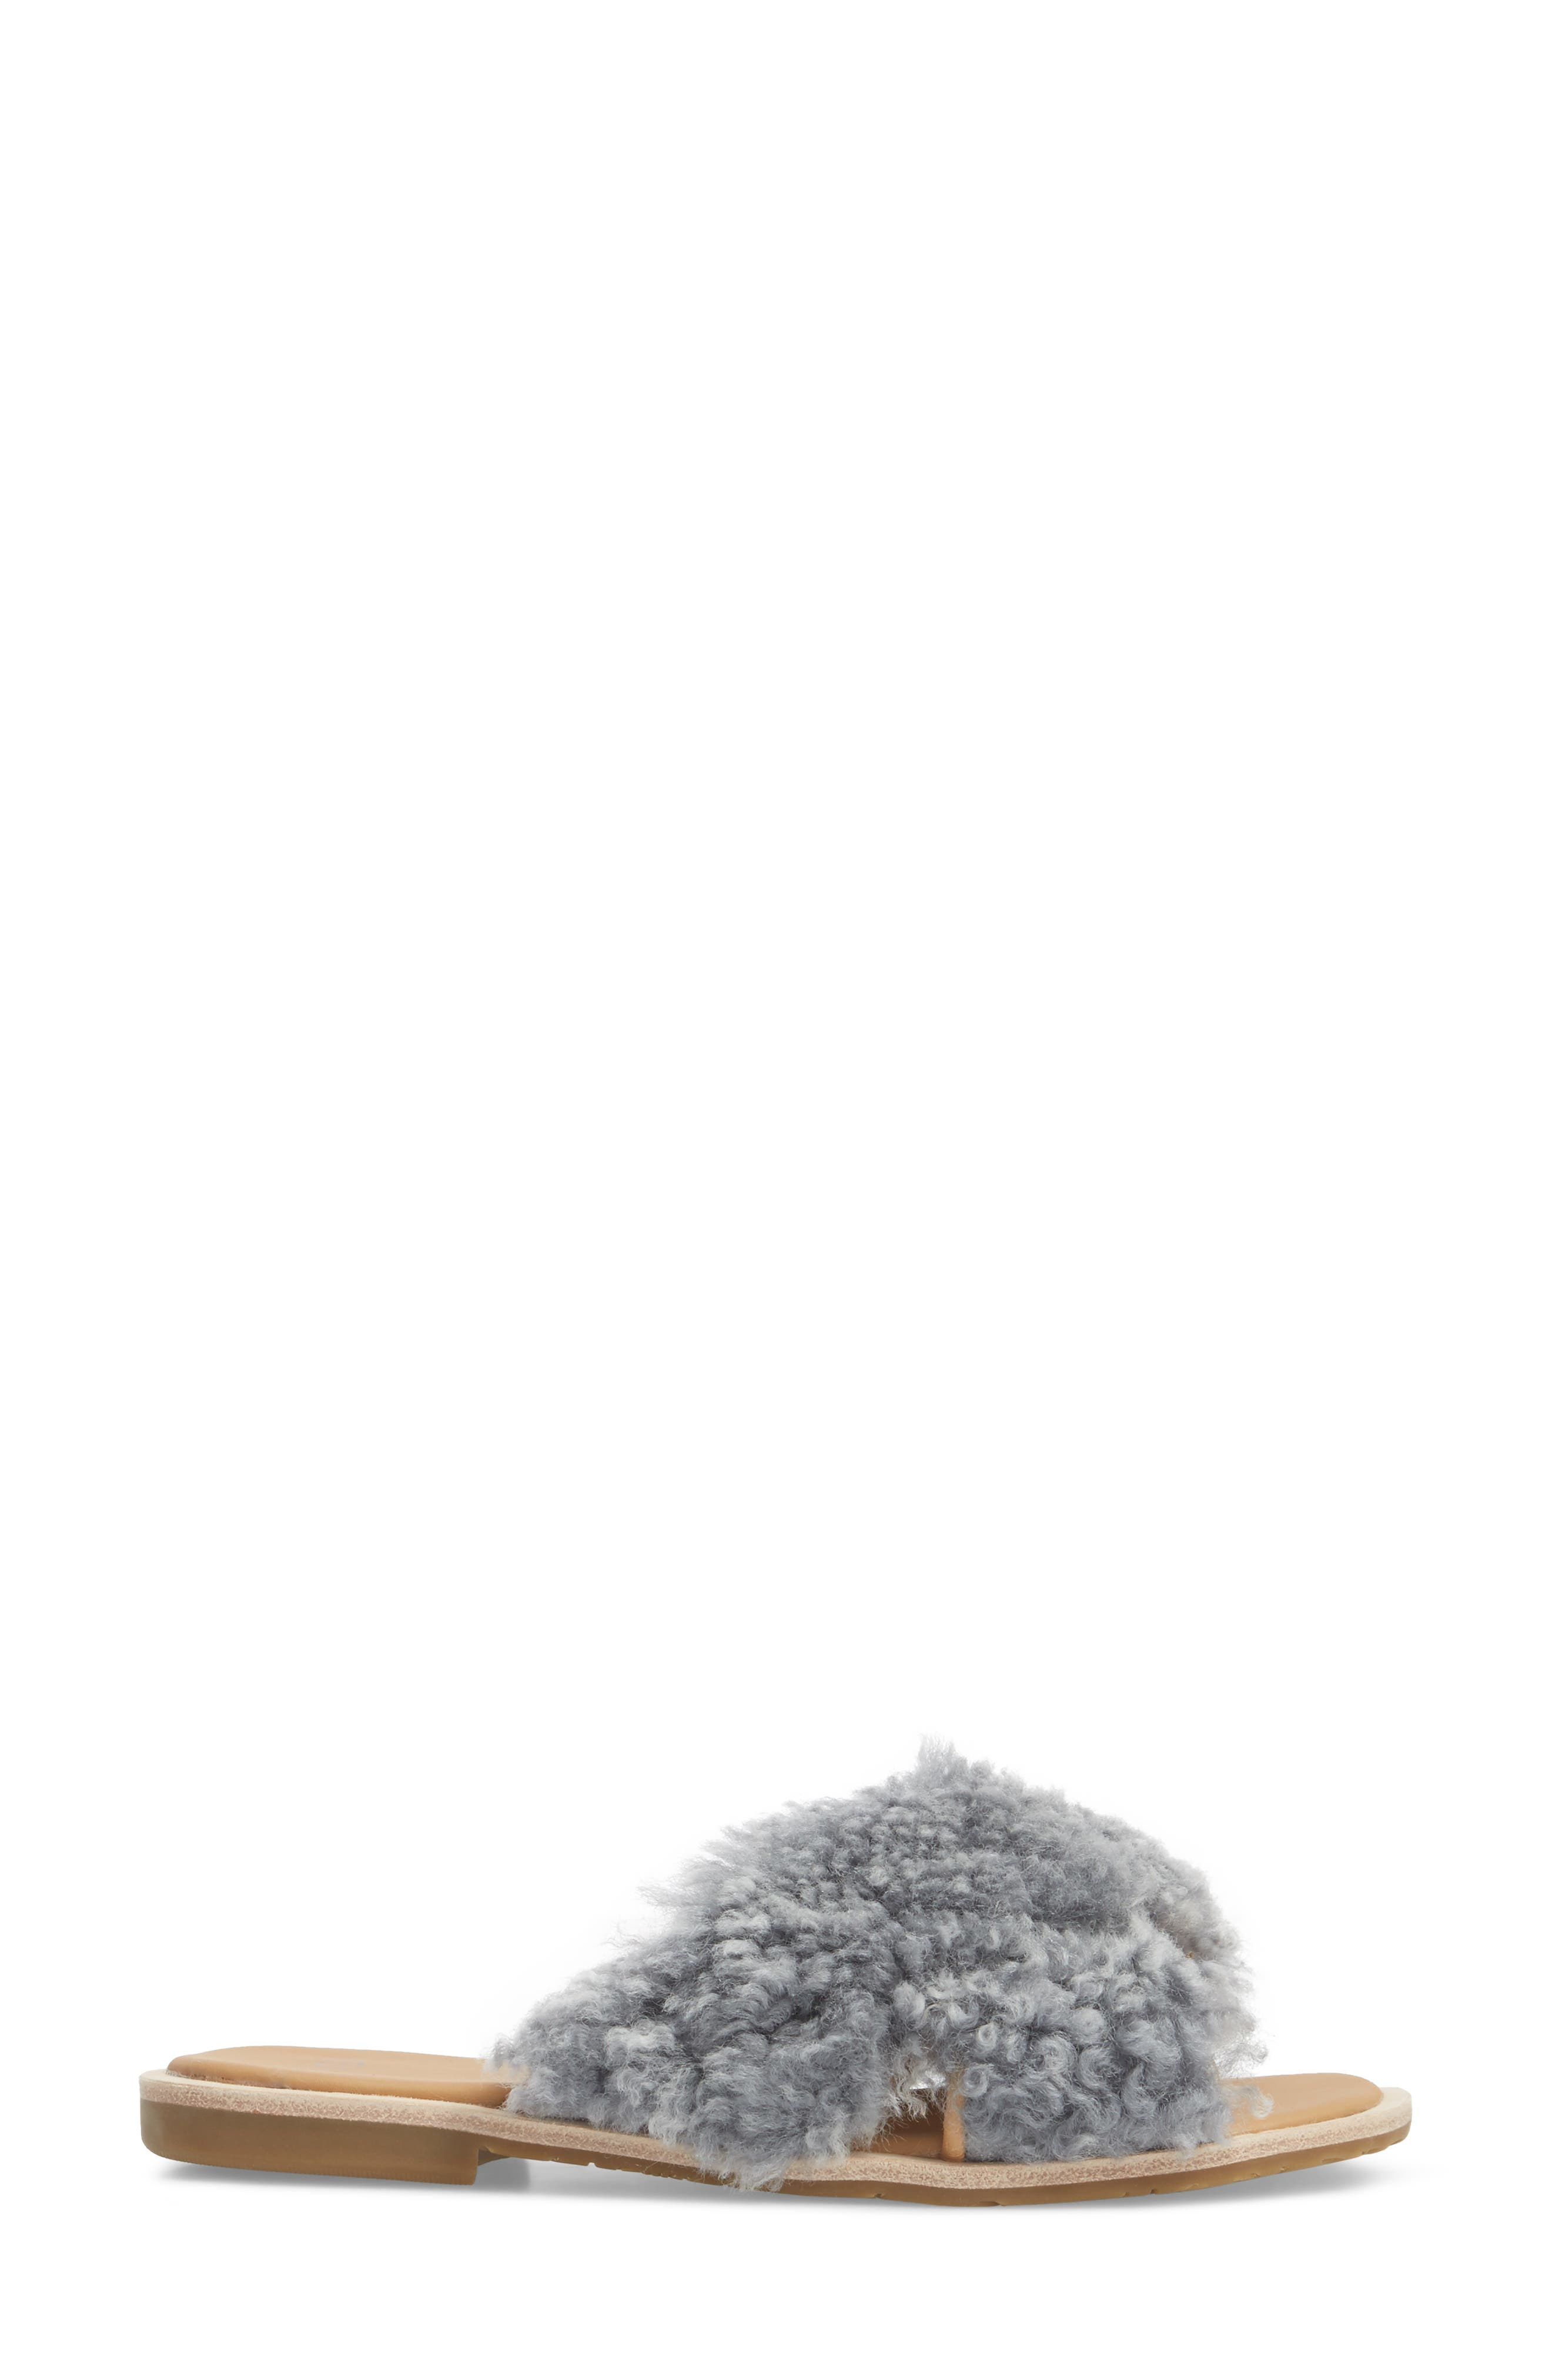 Joni Genuine Shearling Slide Sandal,                             Alternate thumbnail 3, color,                             LUDE GREY